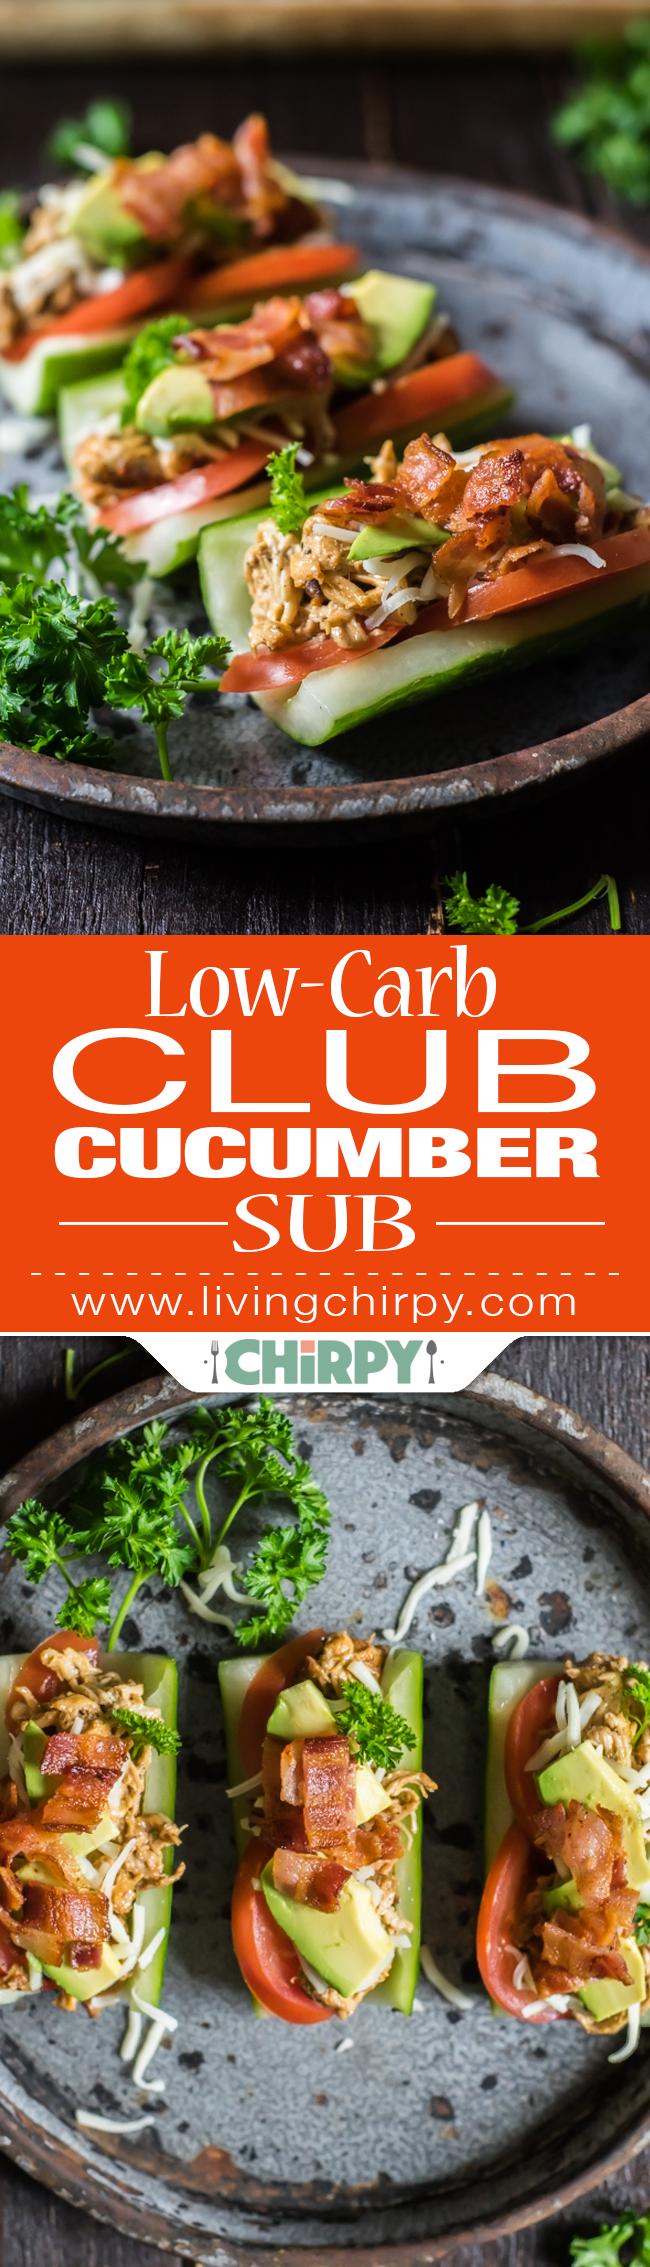 low-carb club cucumber sub